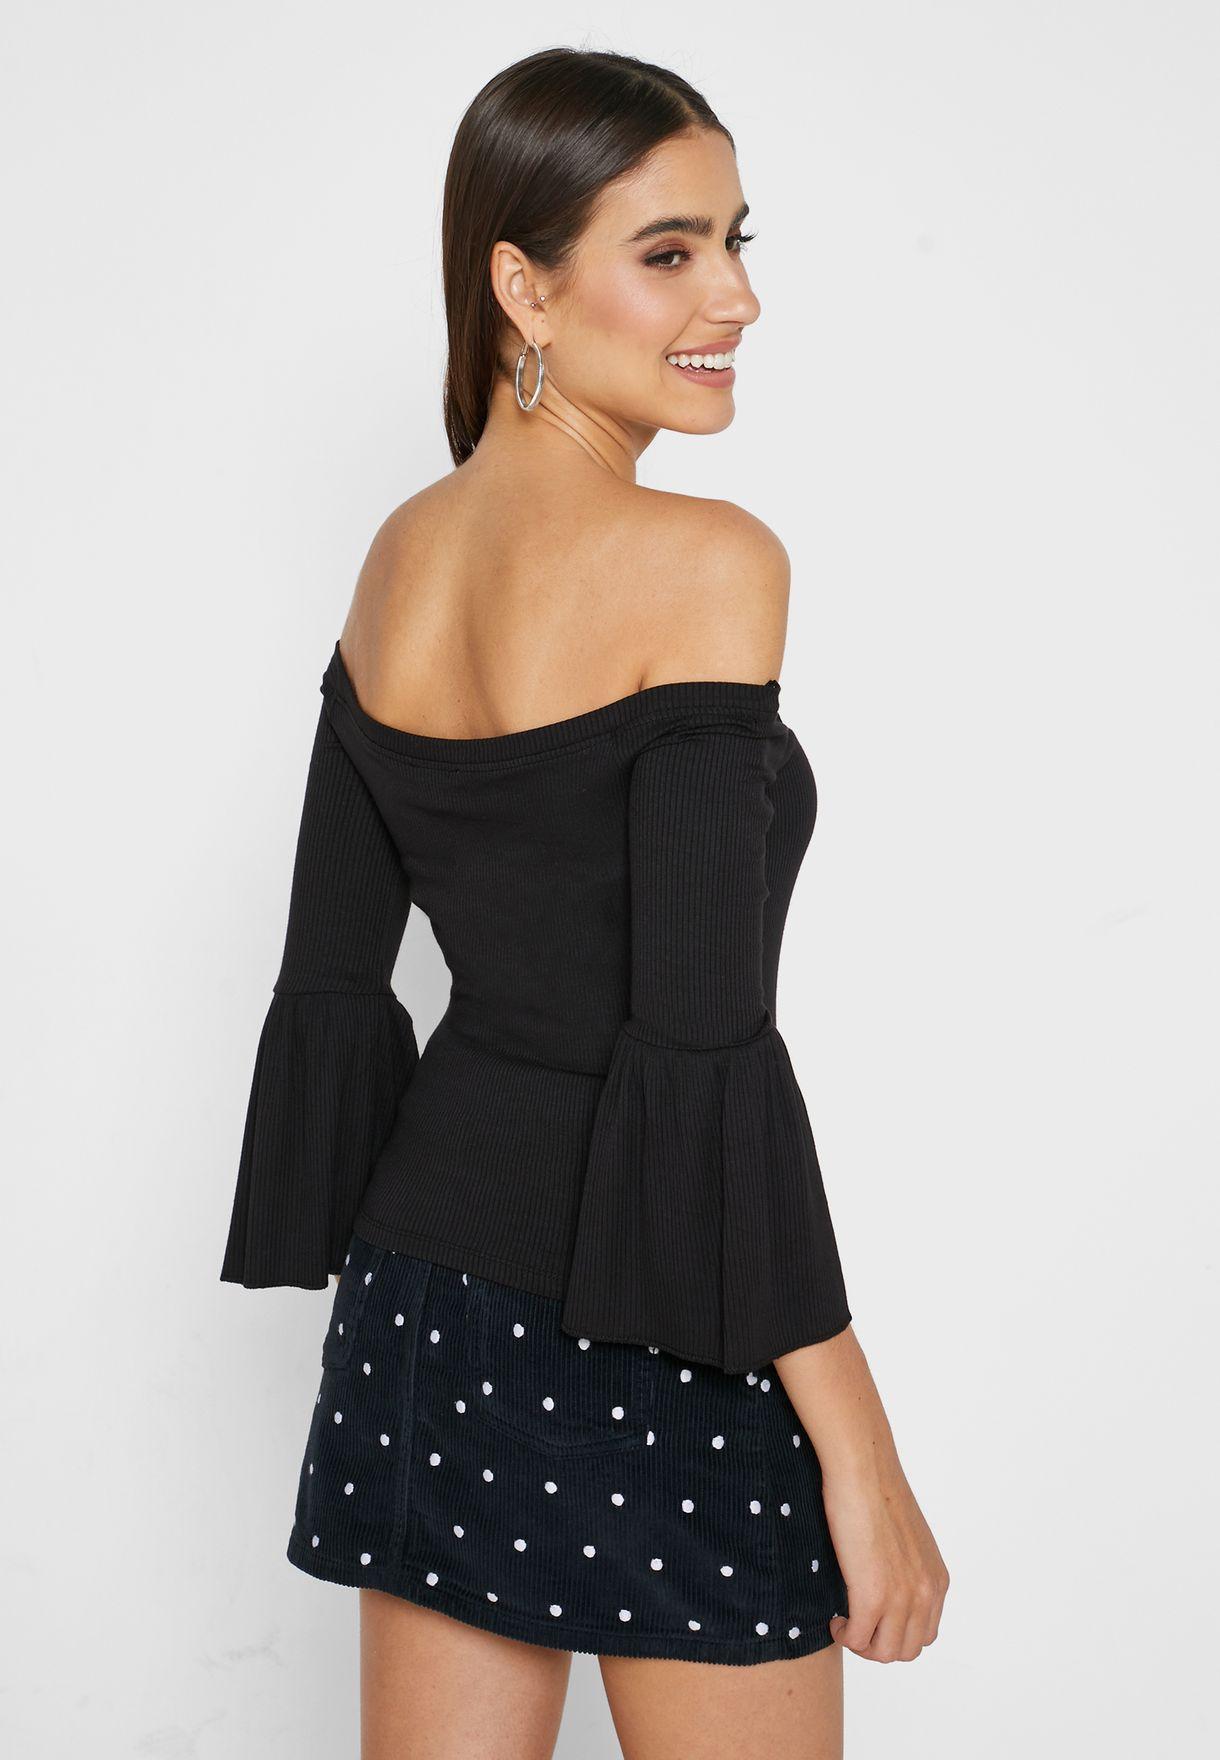 Buy Forever 21 Black Bell Sleeve Bardot Top For Women, Uae 20008at99acp